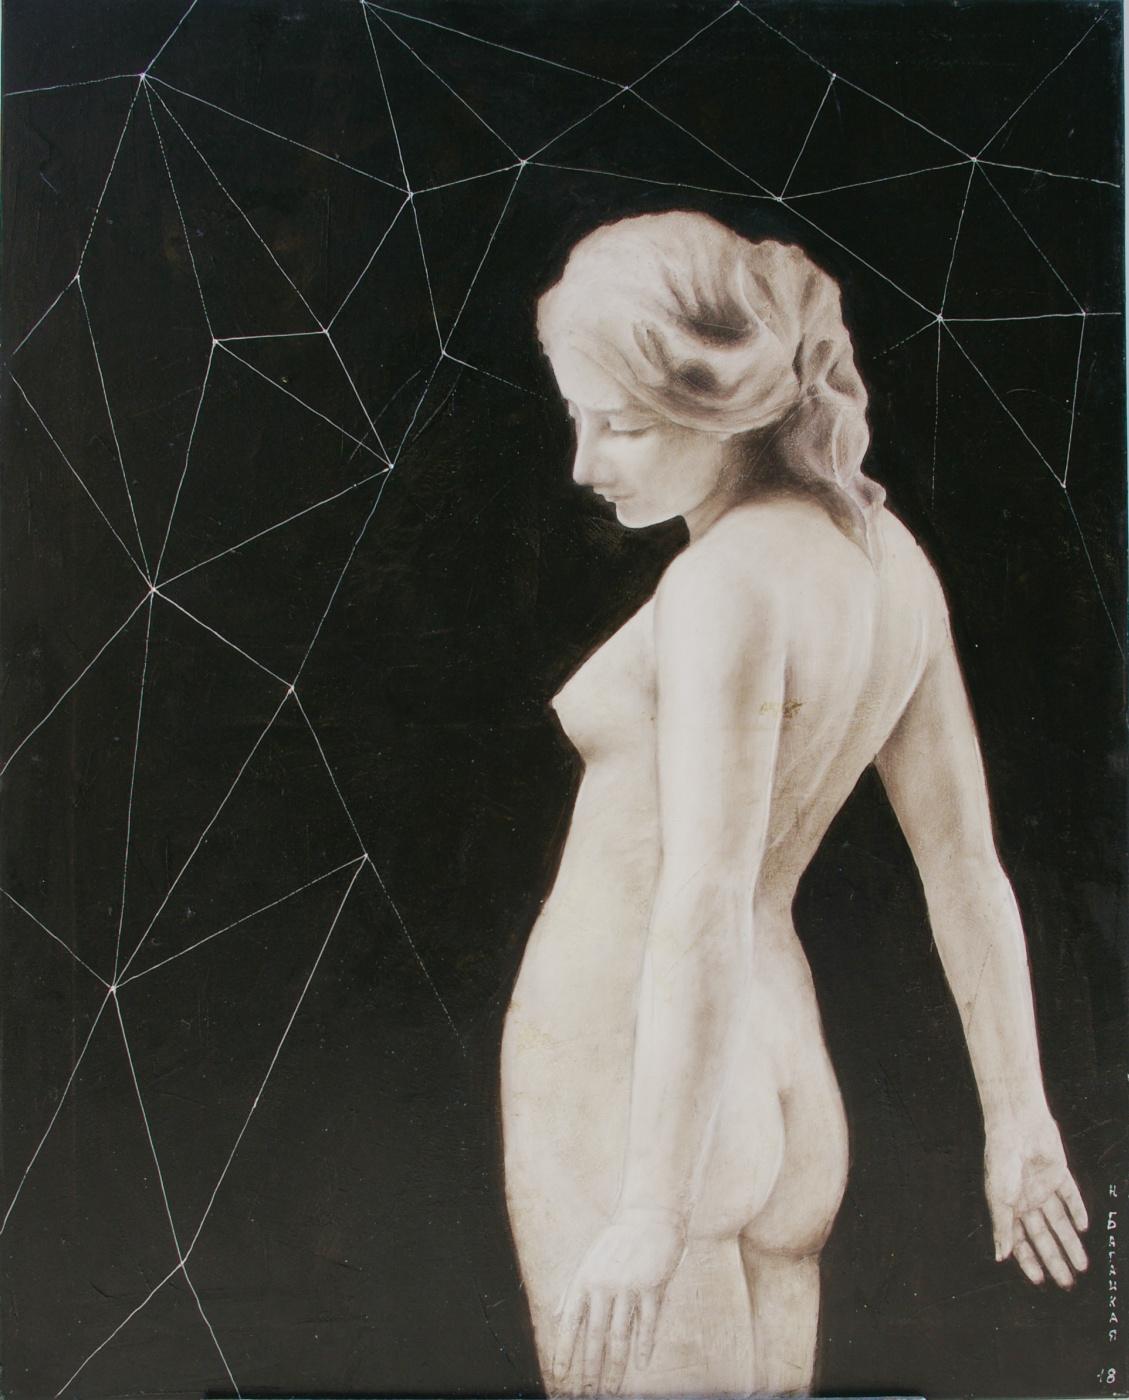 Natalia Bagatskaya. When clothes are dropped